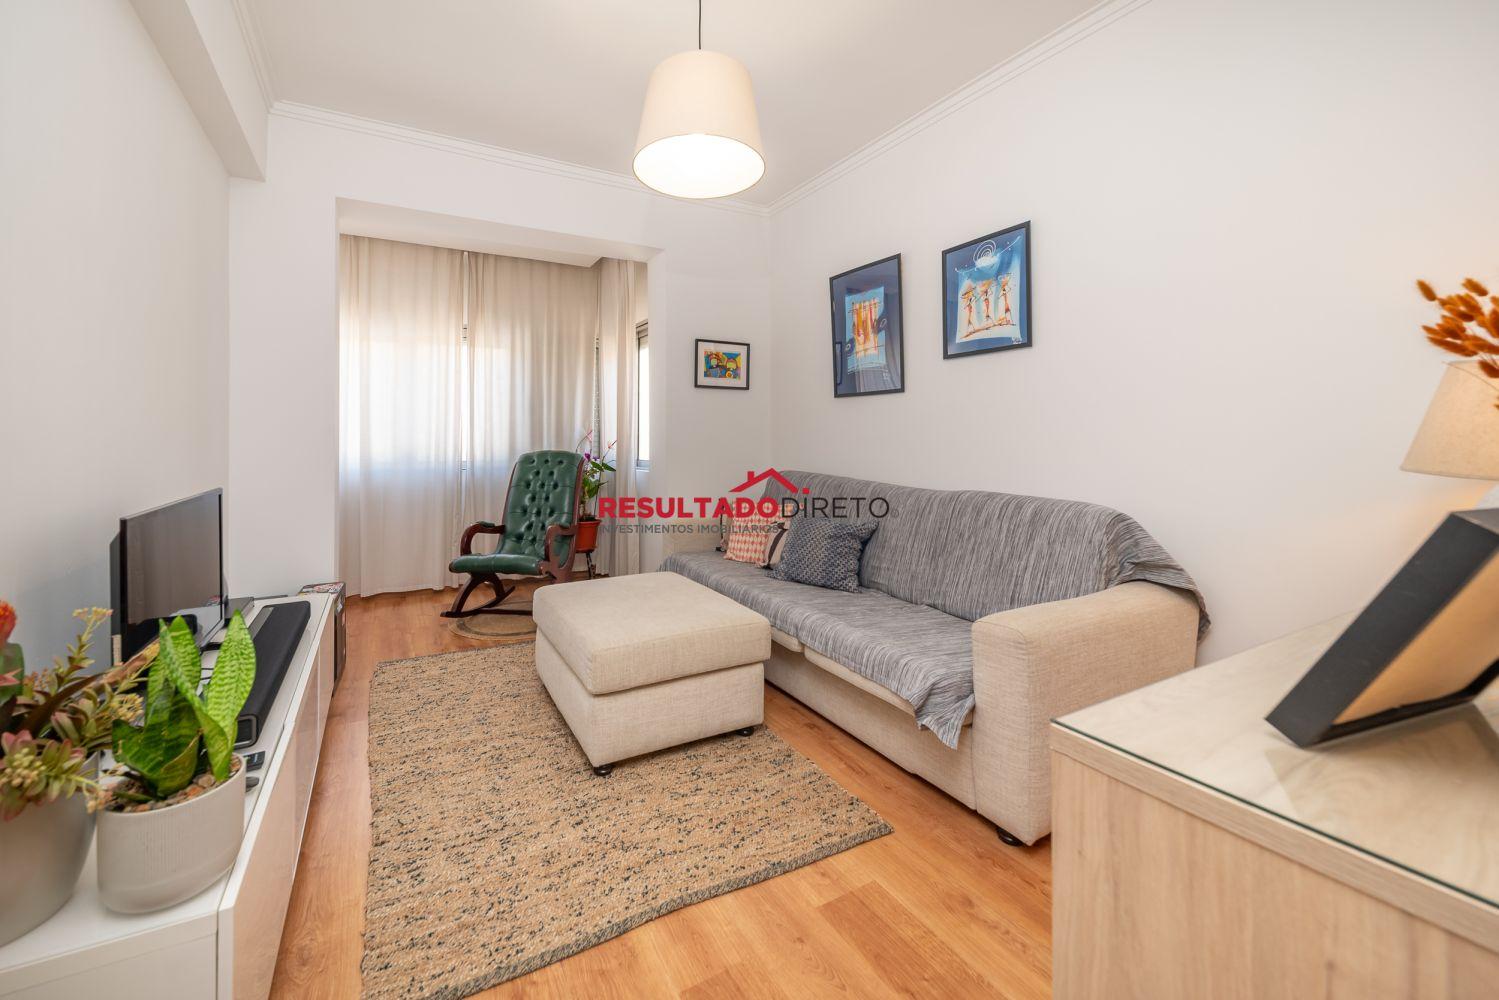 Venda Apartamento T2+1